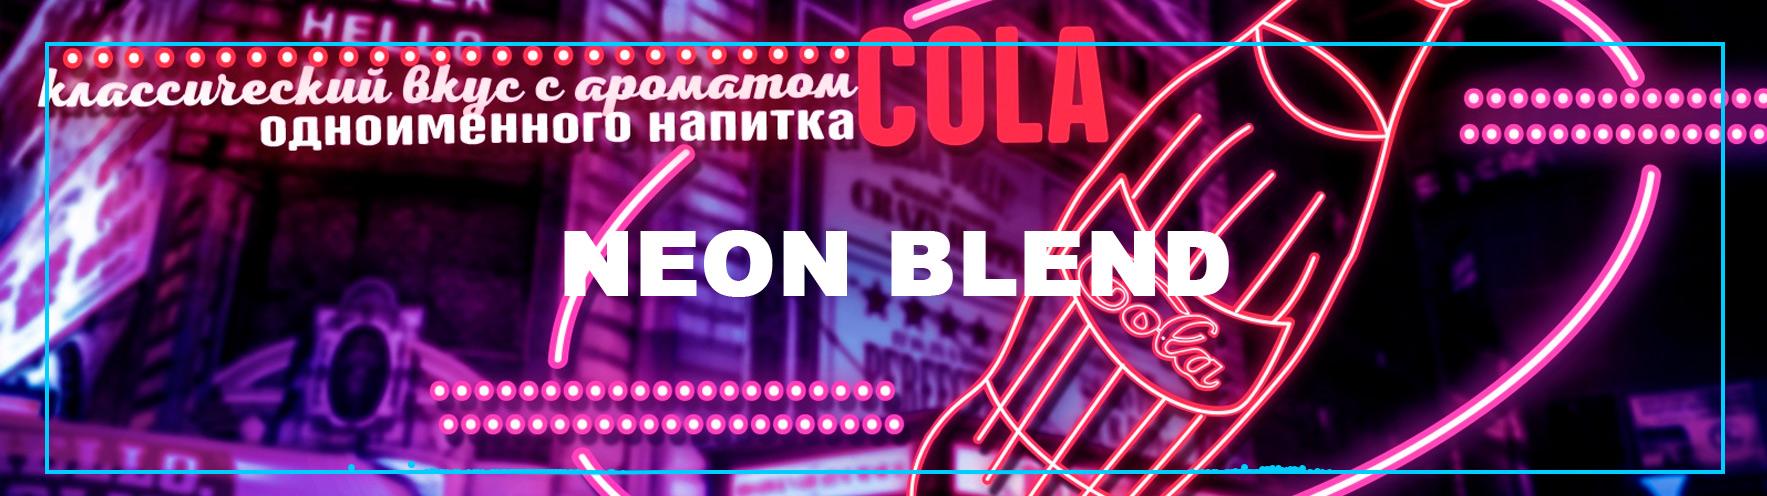 bestabachnaja smes dlja kaljana neon blend optom v ilfumo - Бестабачная смесь для кальяна Neon Blend